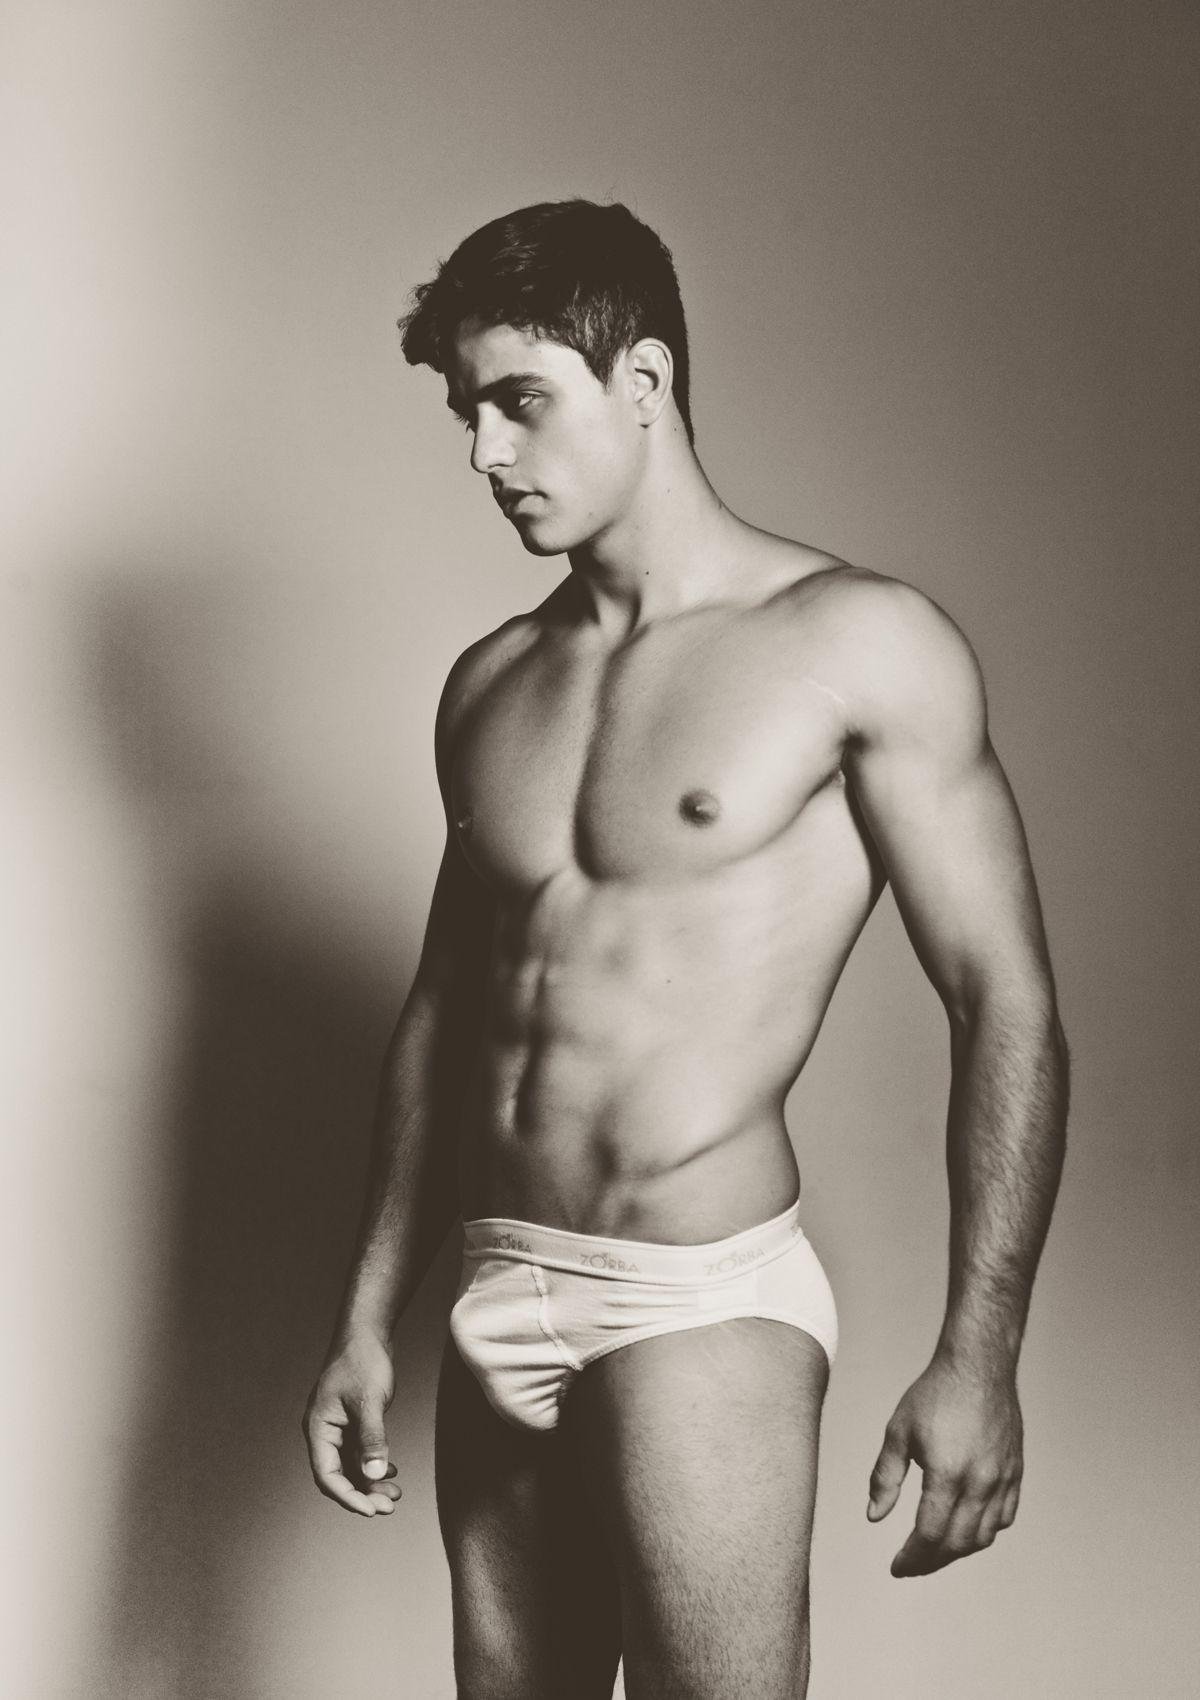 Saxy nude photo india